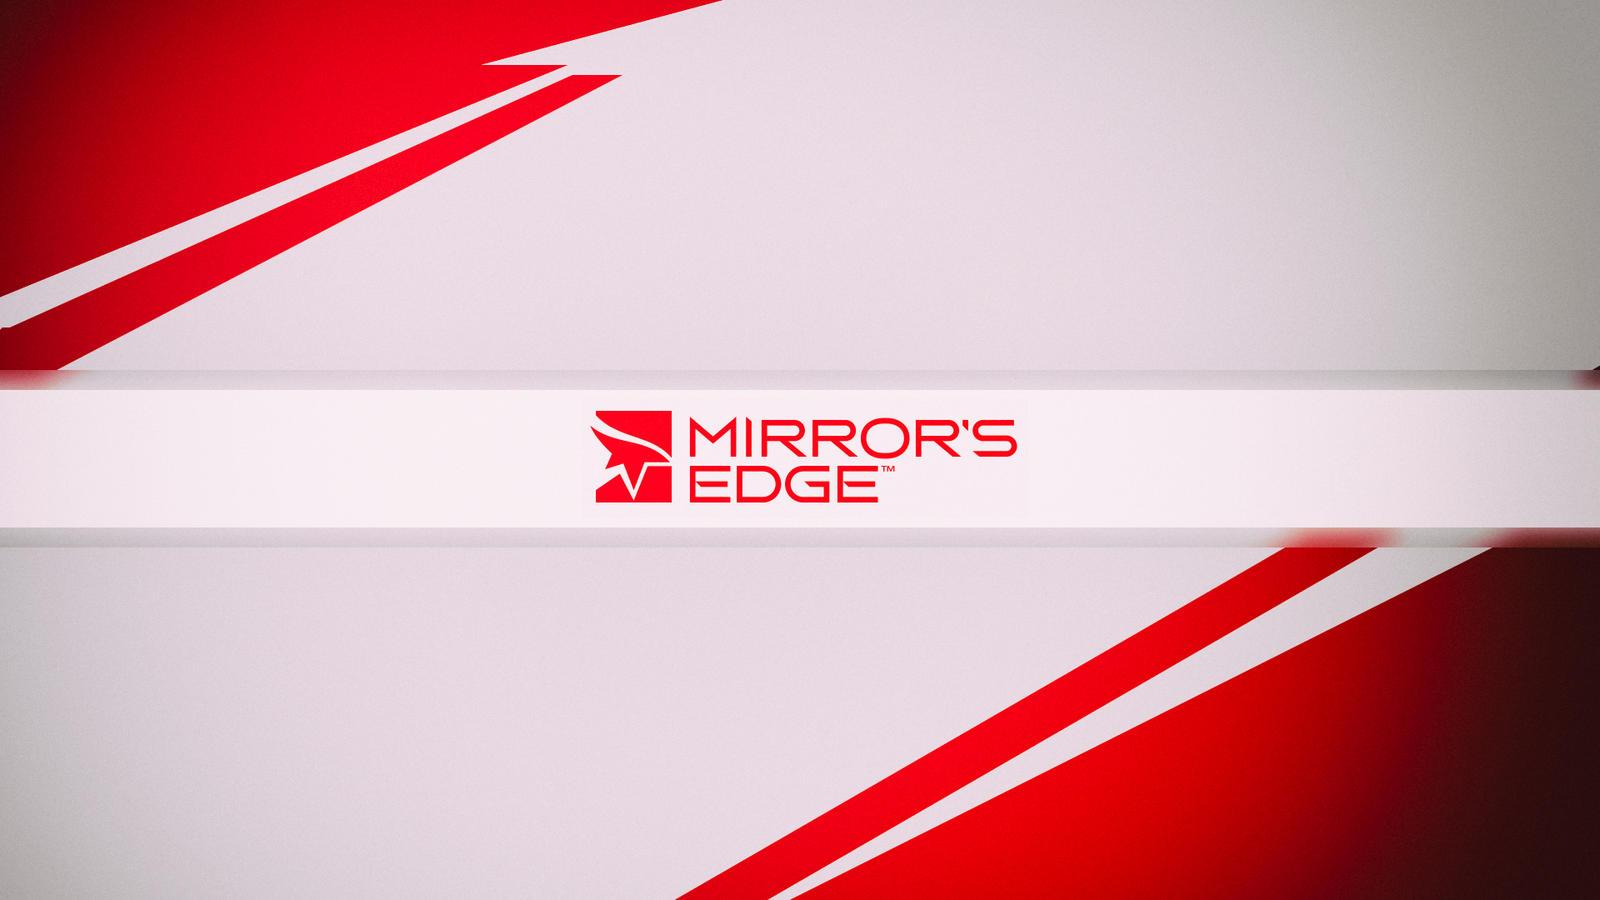 Mirror's Edge Wallpaper by Binary-Map